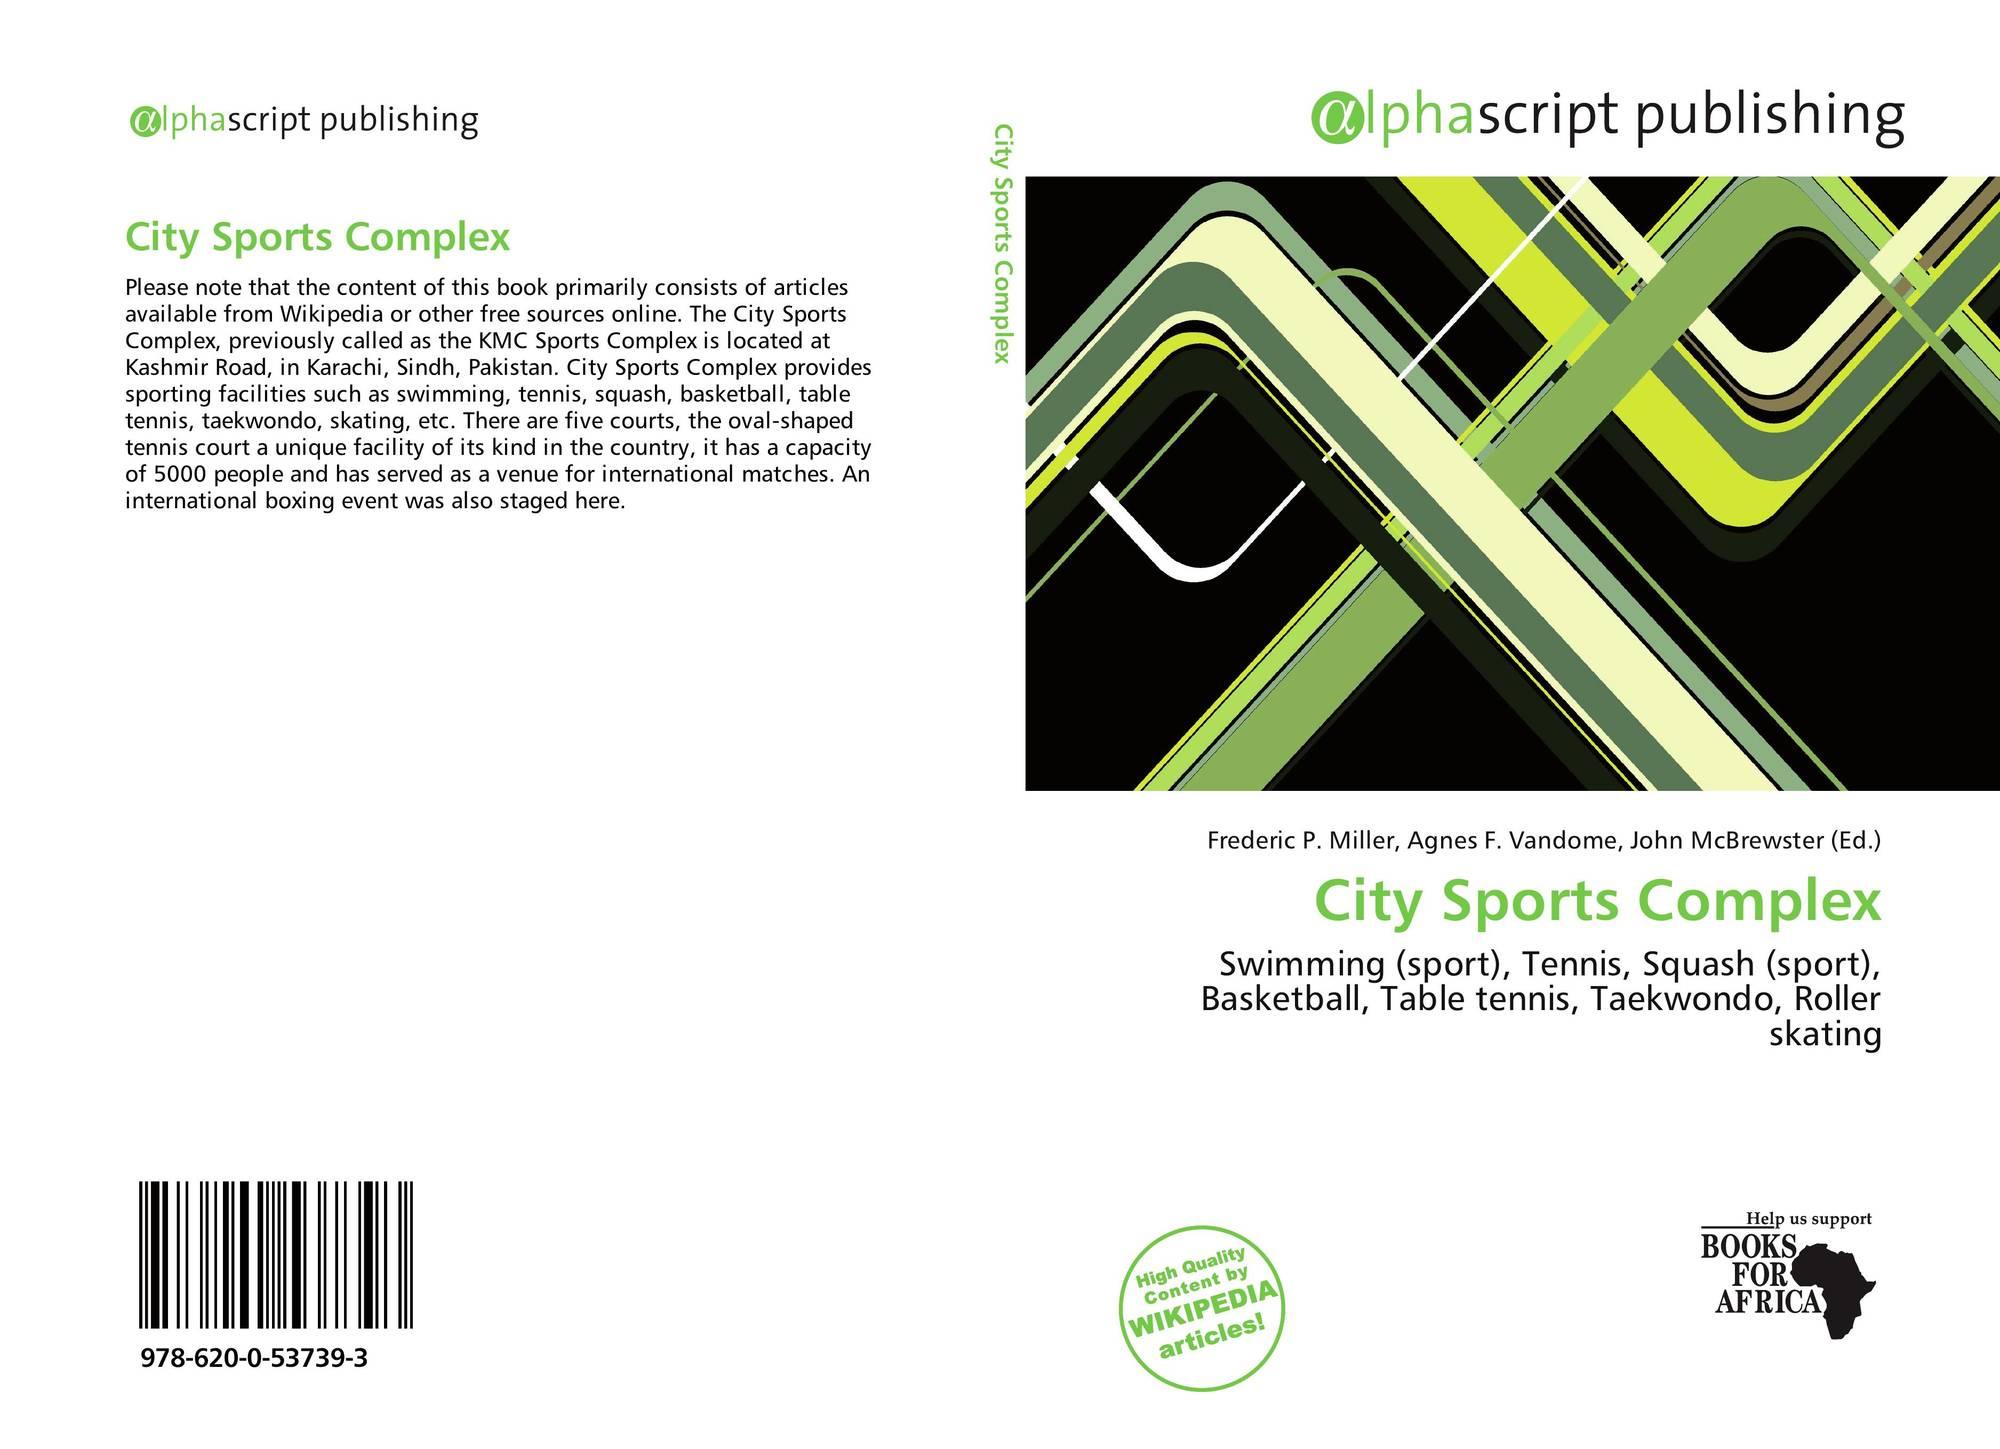 City Sports Complex 978 620 0 53739 3 6200537399 9786200537393